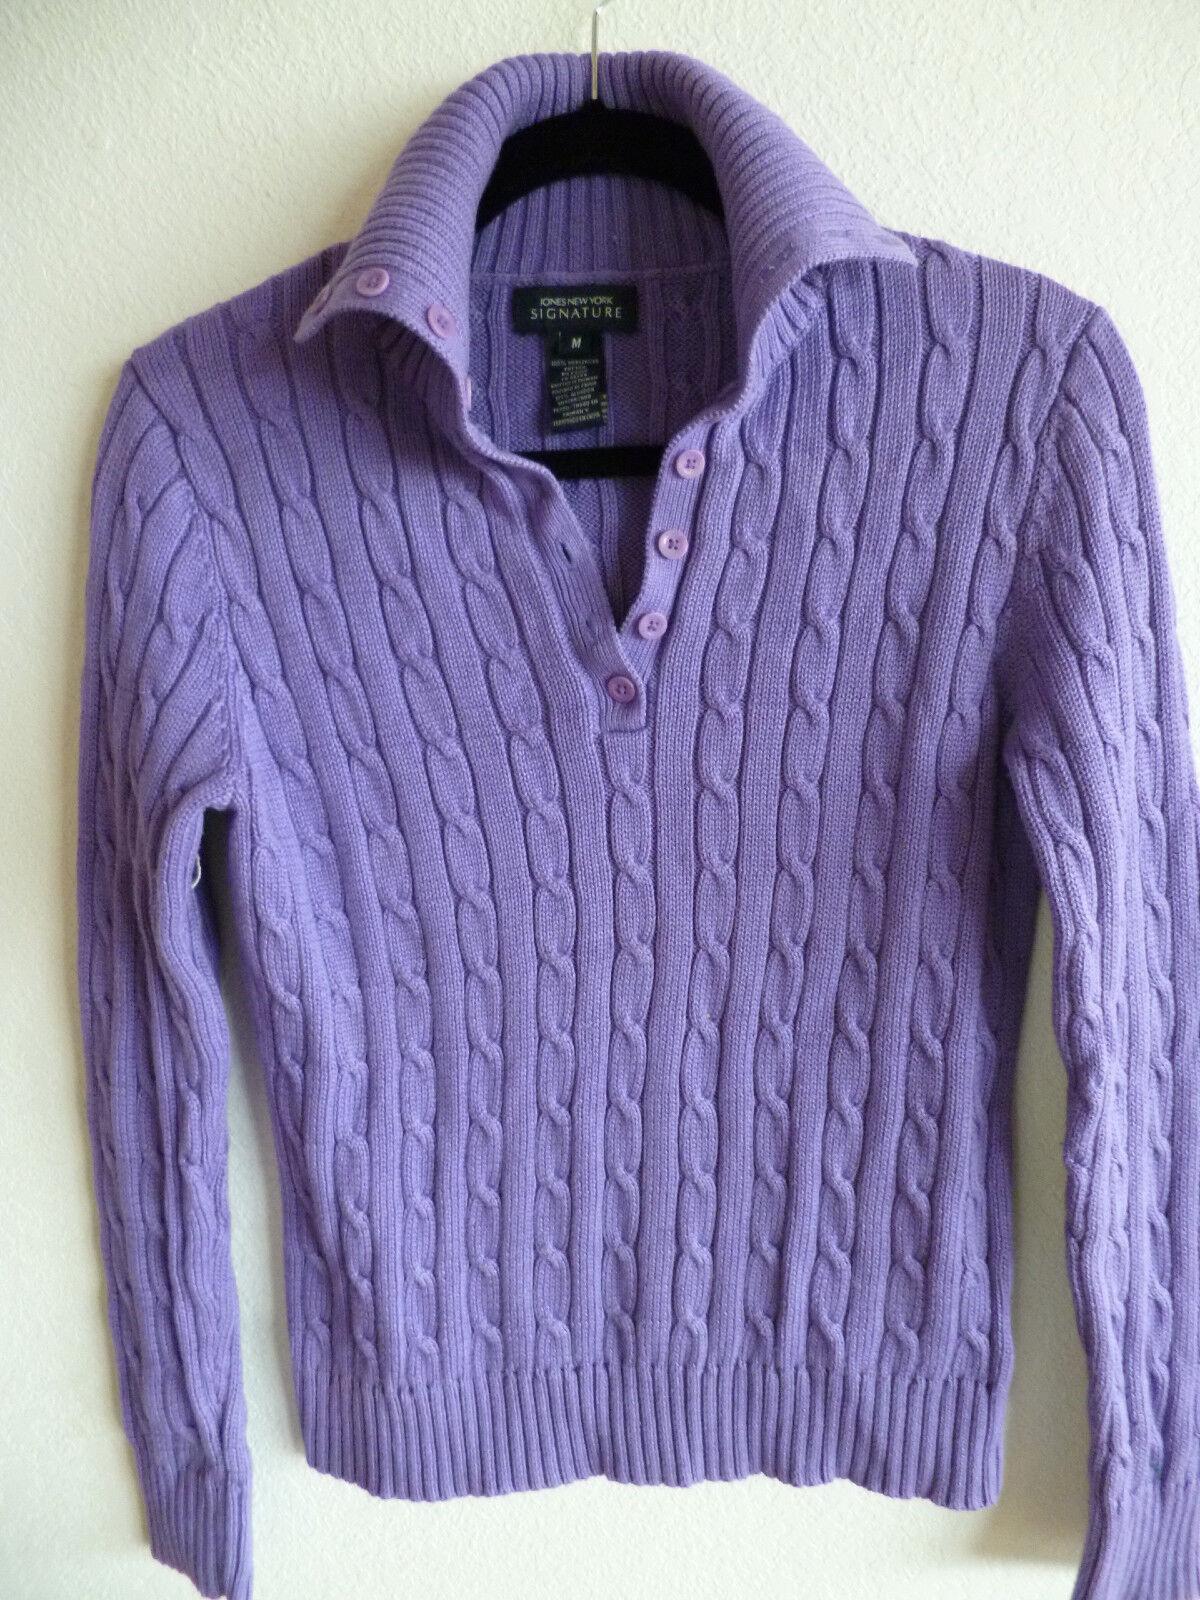 Jones NY Signature  Cotton Purple Cable Knit Sweater w  Collar  M